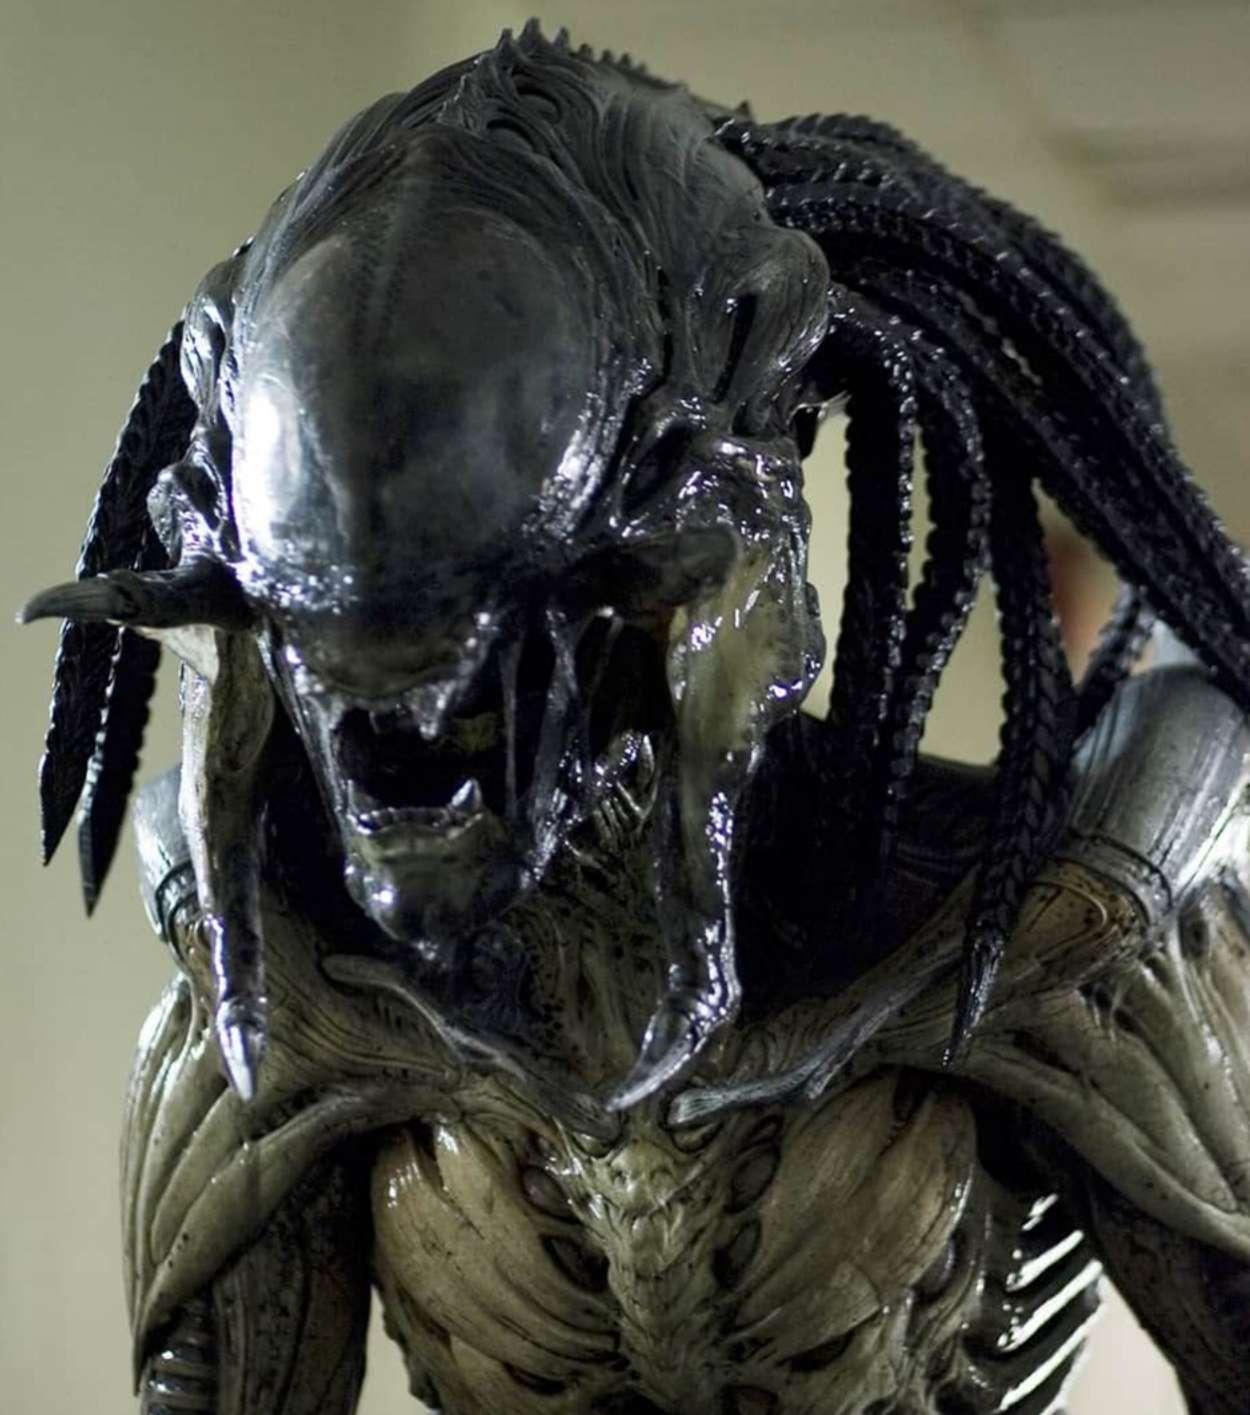 Predalien (Alien vs. Predator Requiem, 2007)